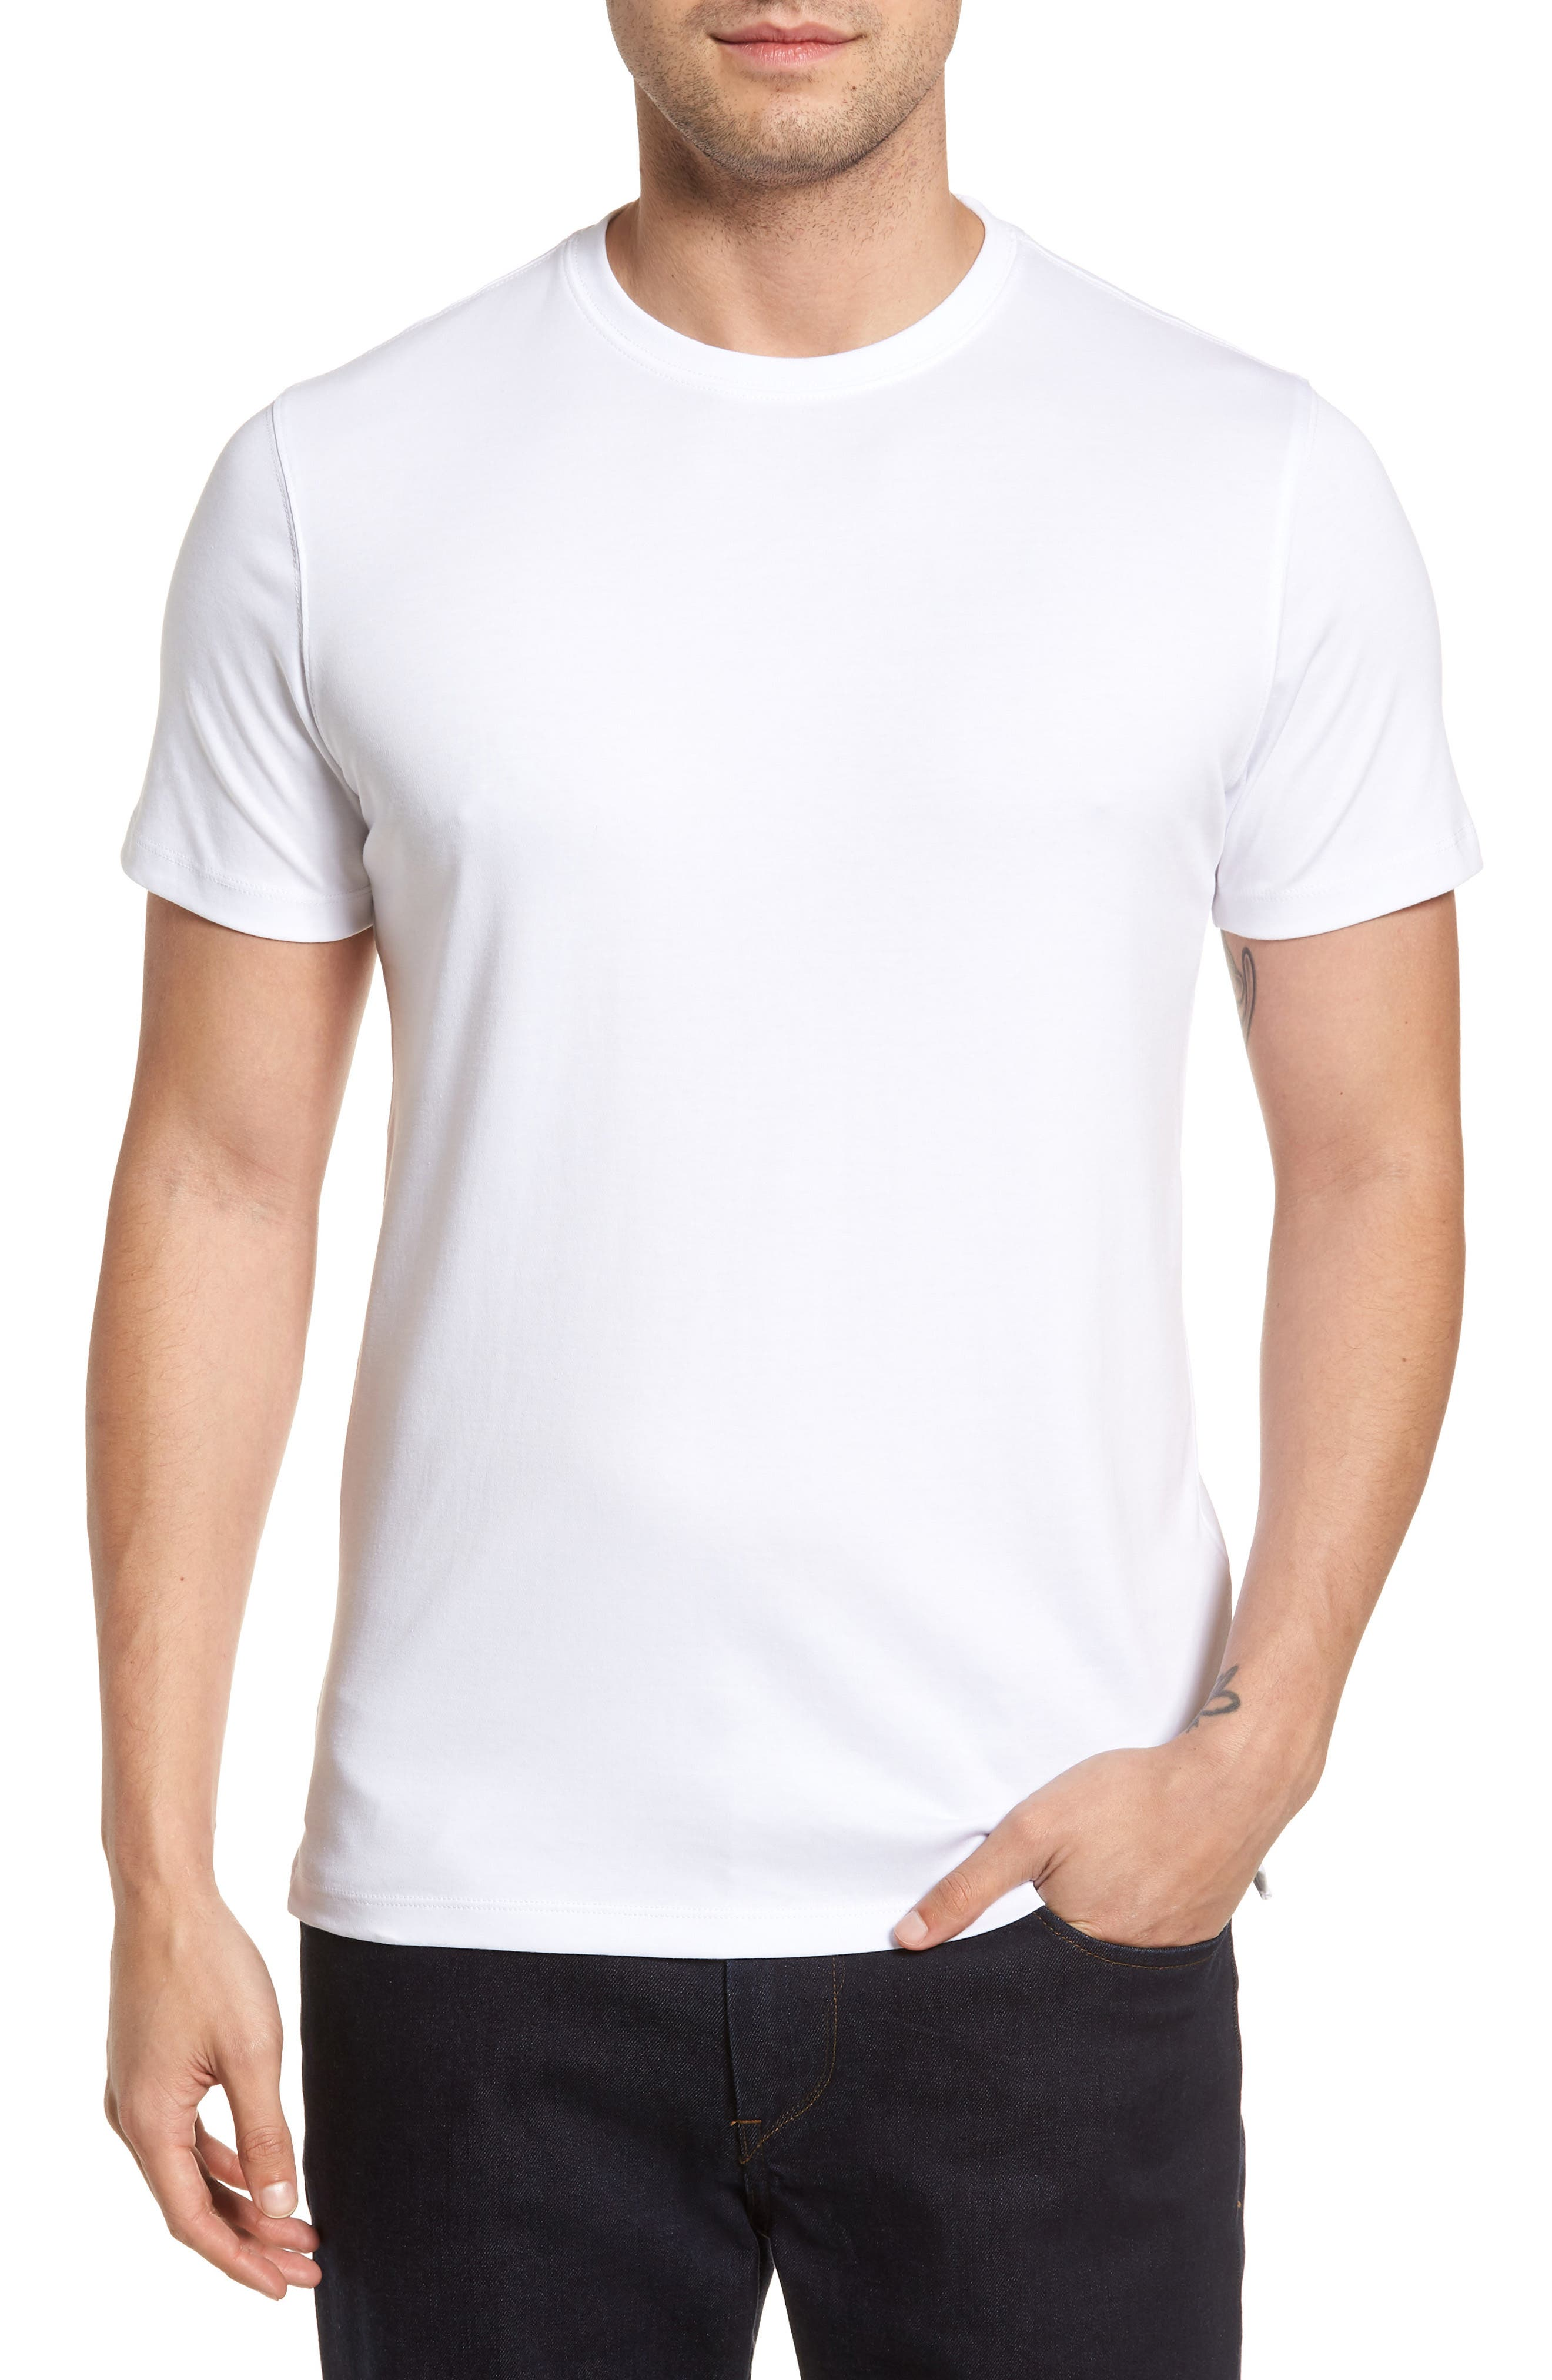 'Georgia' Crewneck T-Shirt, Main, color, WHI